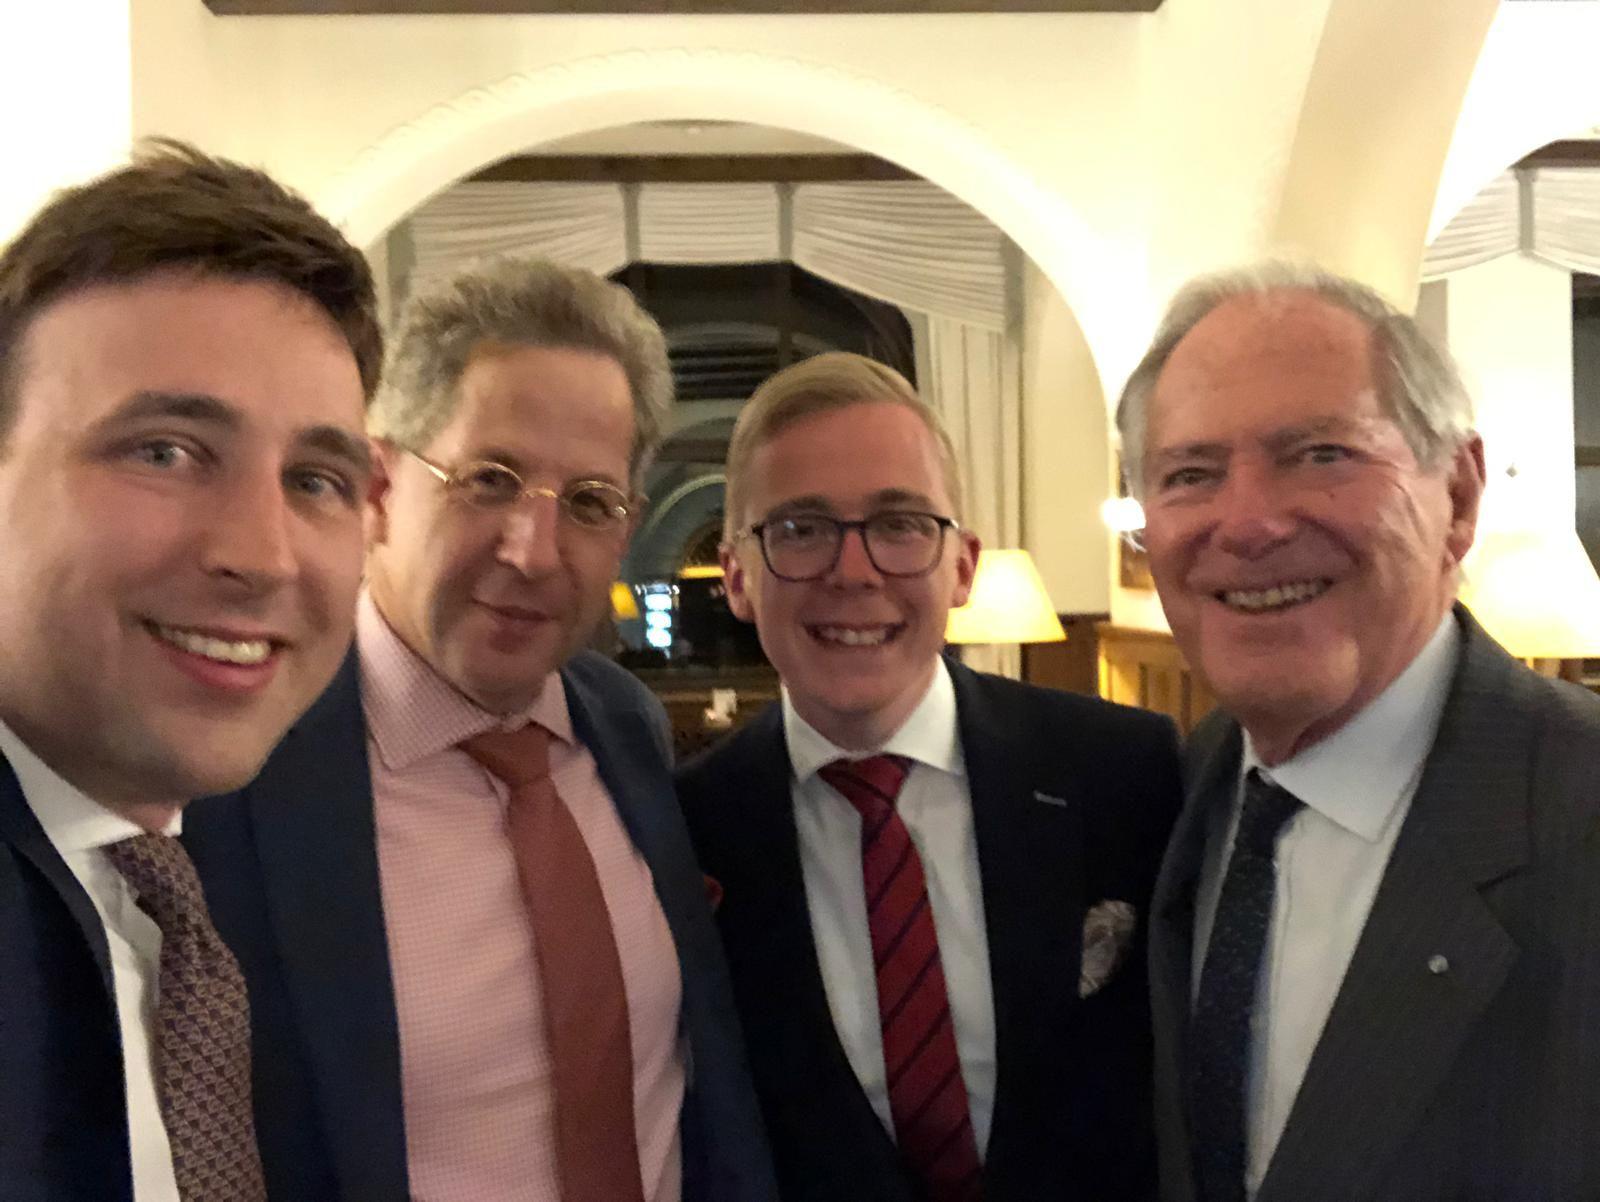 20190730_haupt_amthor_maasen_meeting_germany